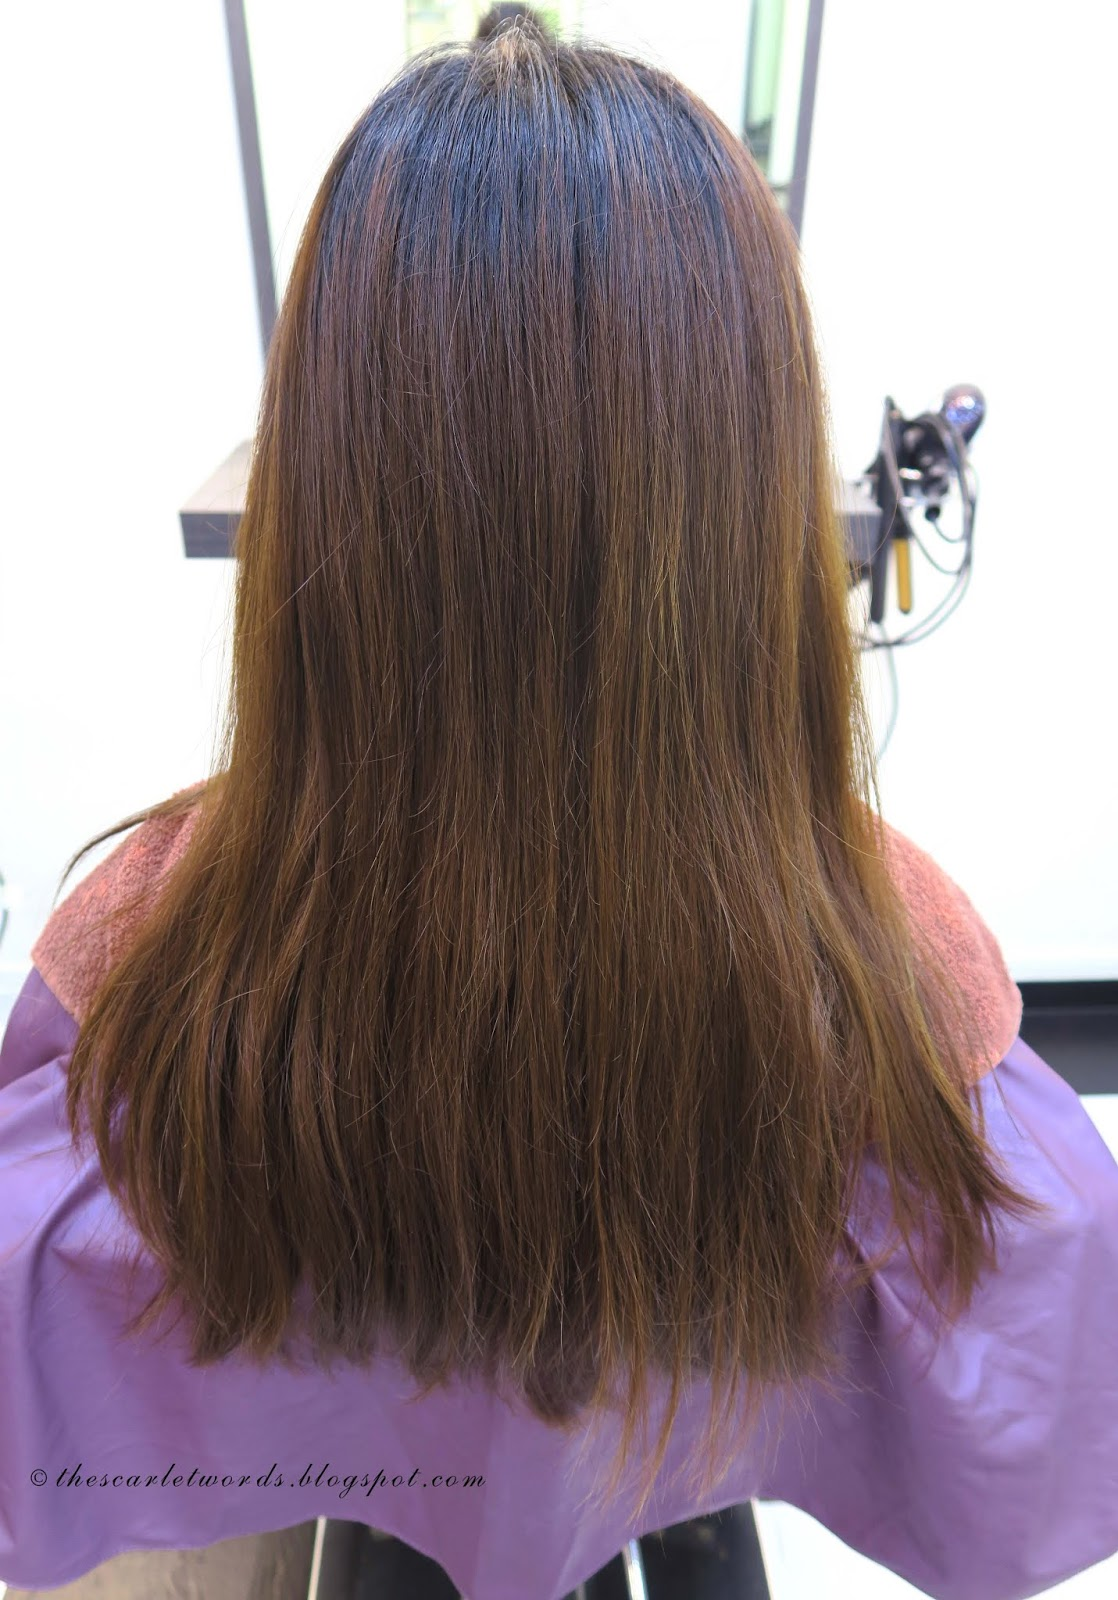 CNY Hair Treatment [Sponsored] - Wanderlust